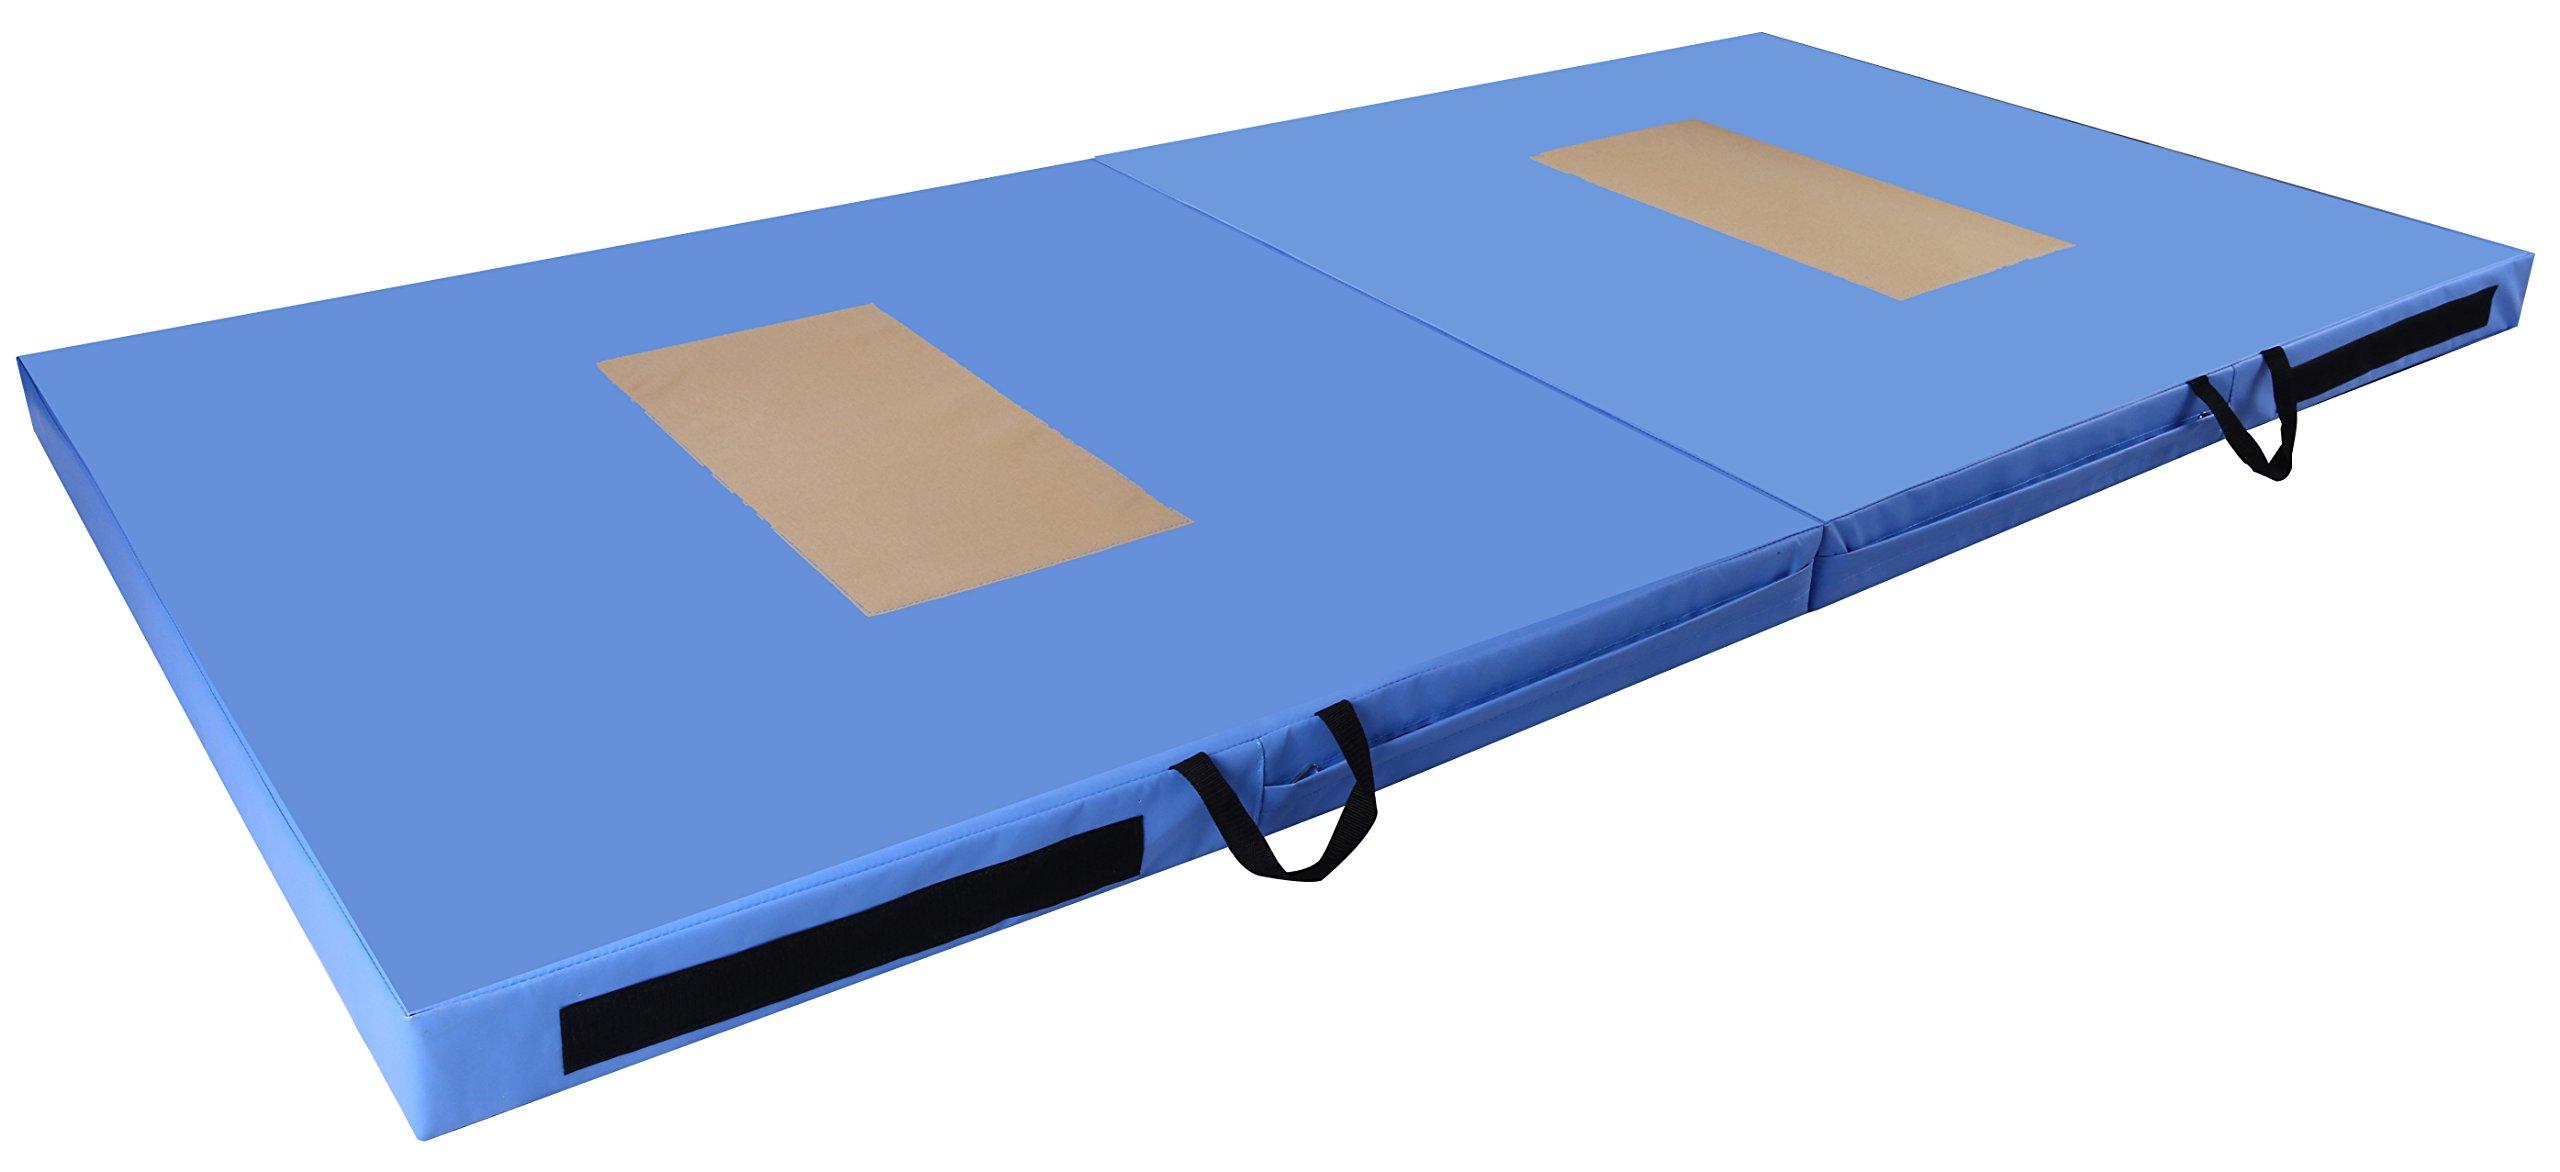 BalanceFrom GoGym All-Purpose 4'x8'x4 Extra Thick High Density Anti-Tear Gymnastics Gym Folding Exercise Aerobics Mats (Blue)